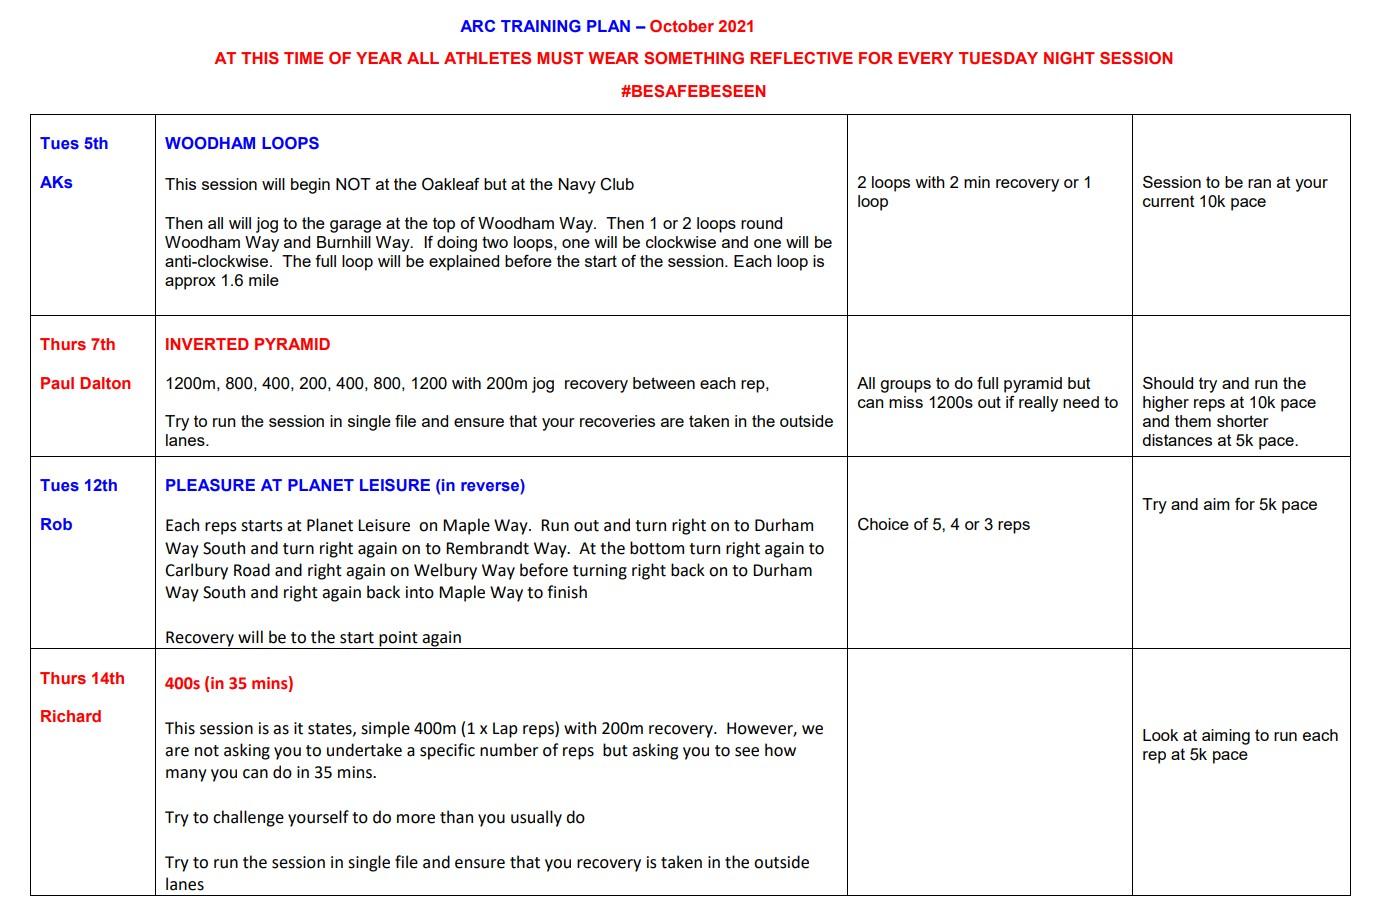 ARC Training Plan October 2021 a